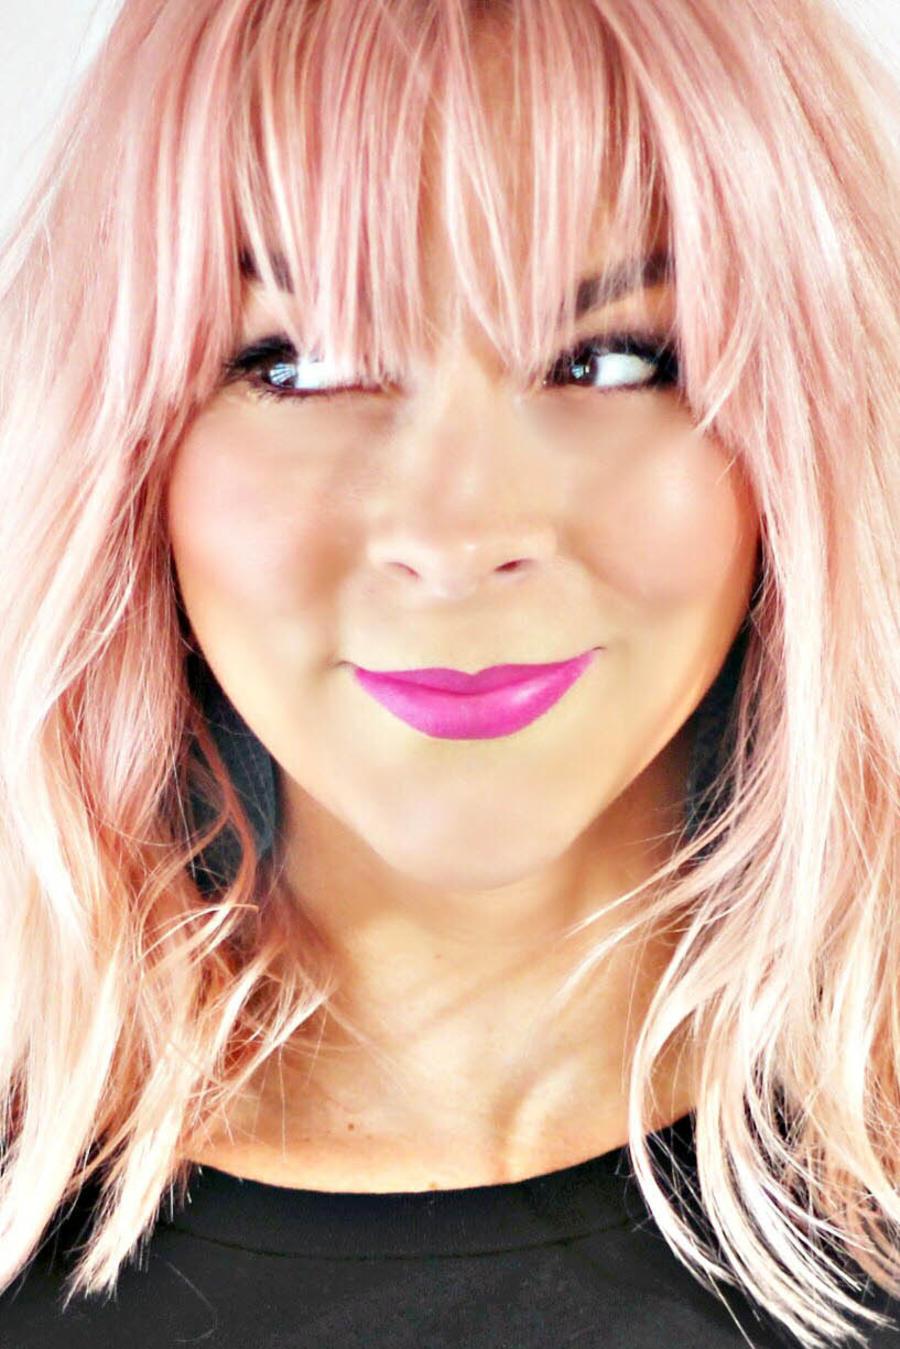 Chica con cabello rosado